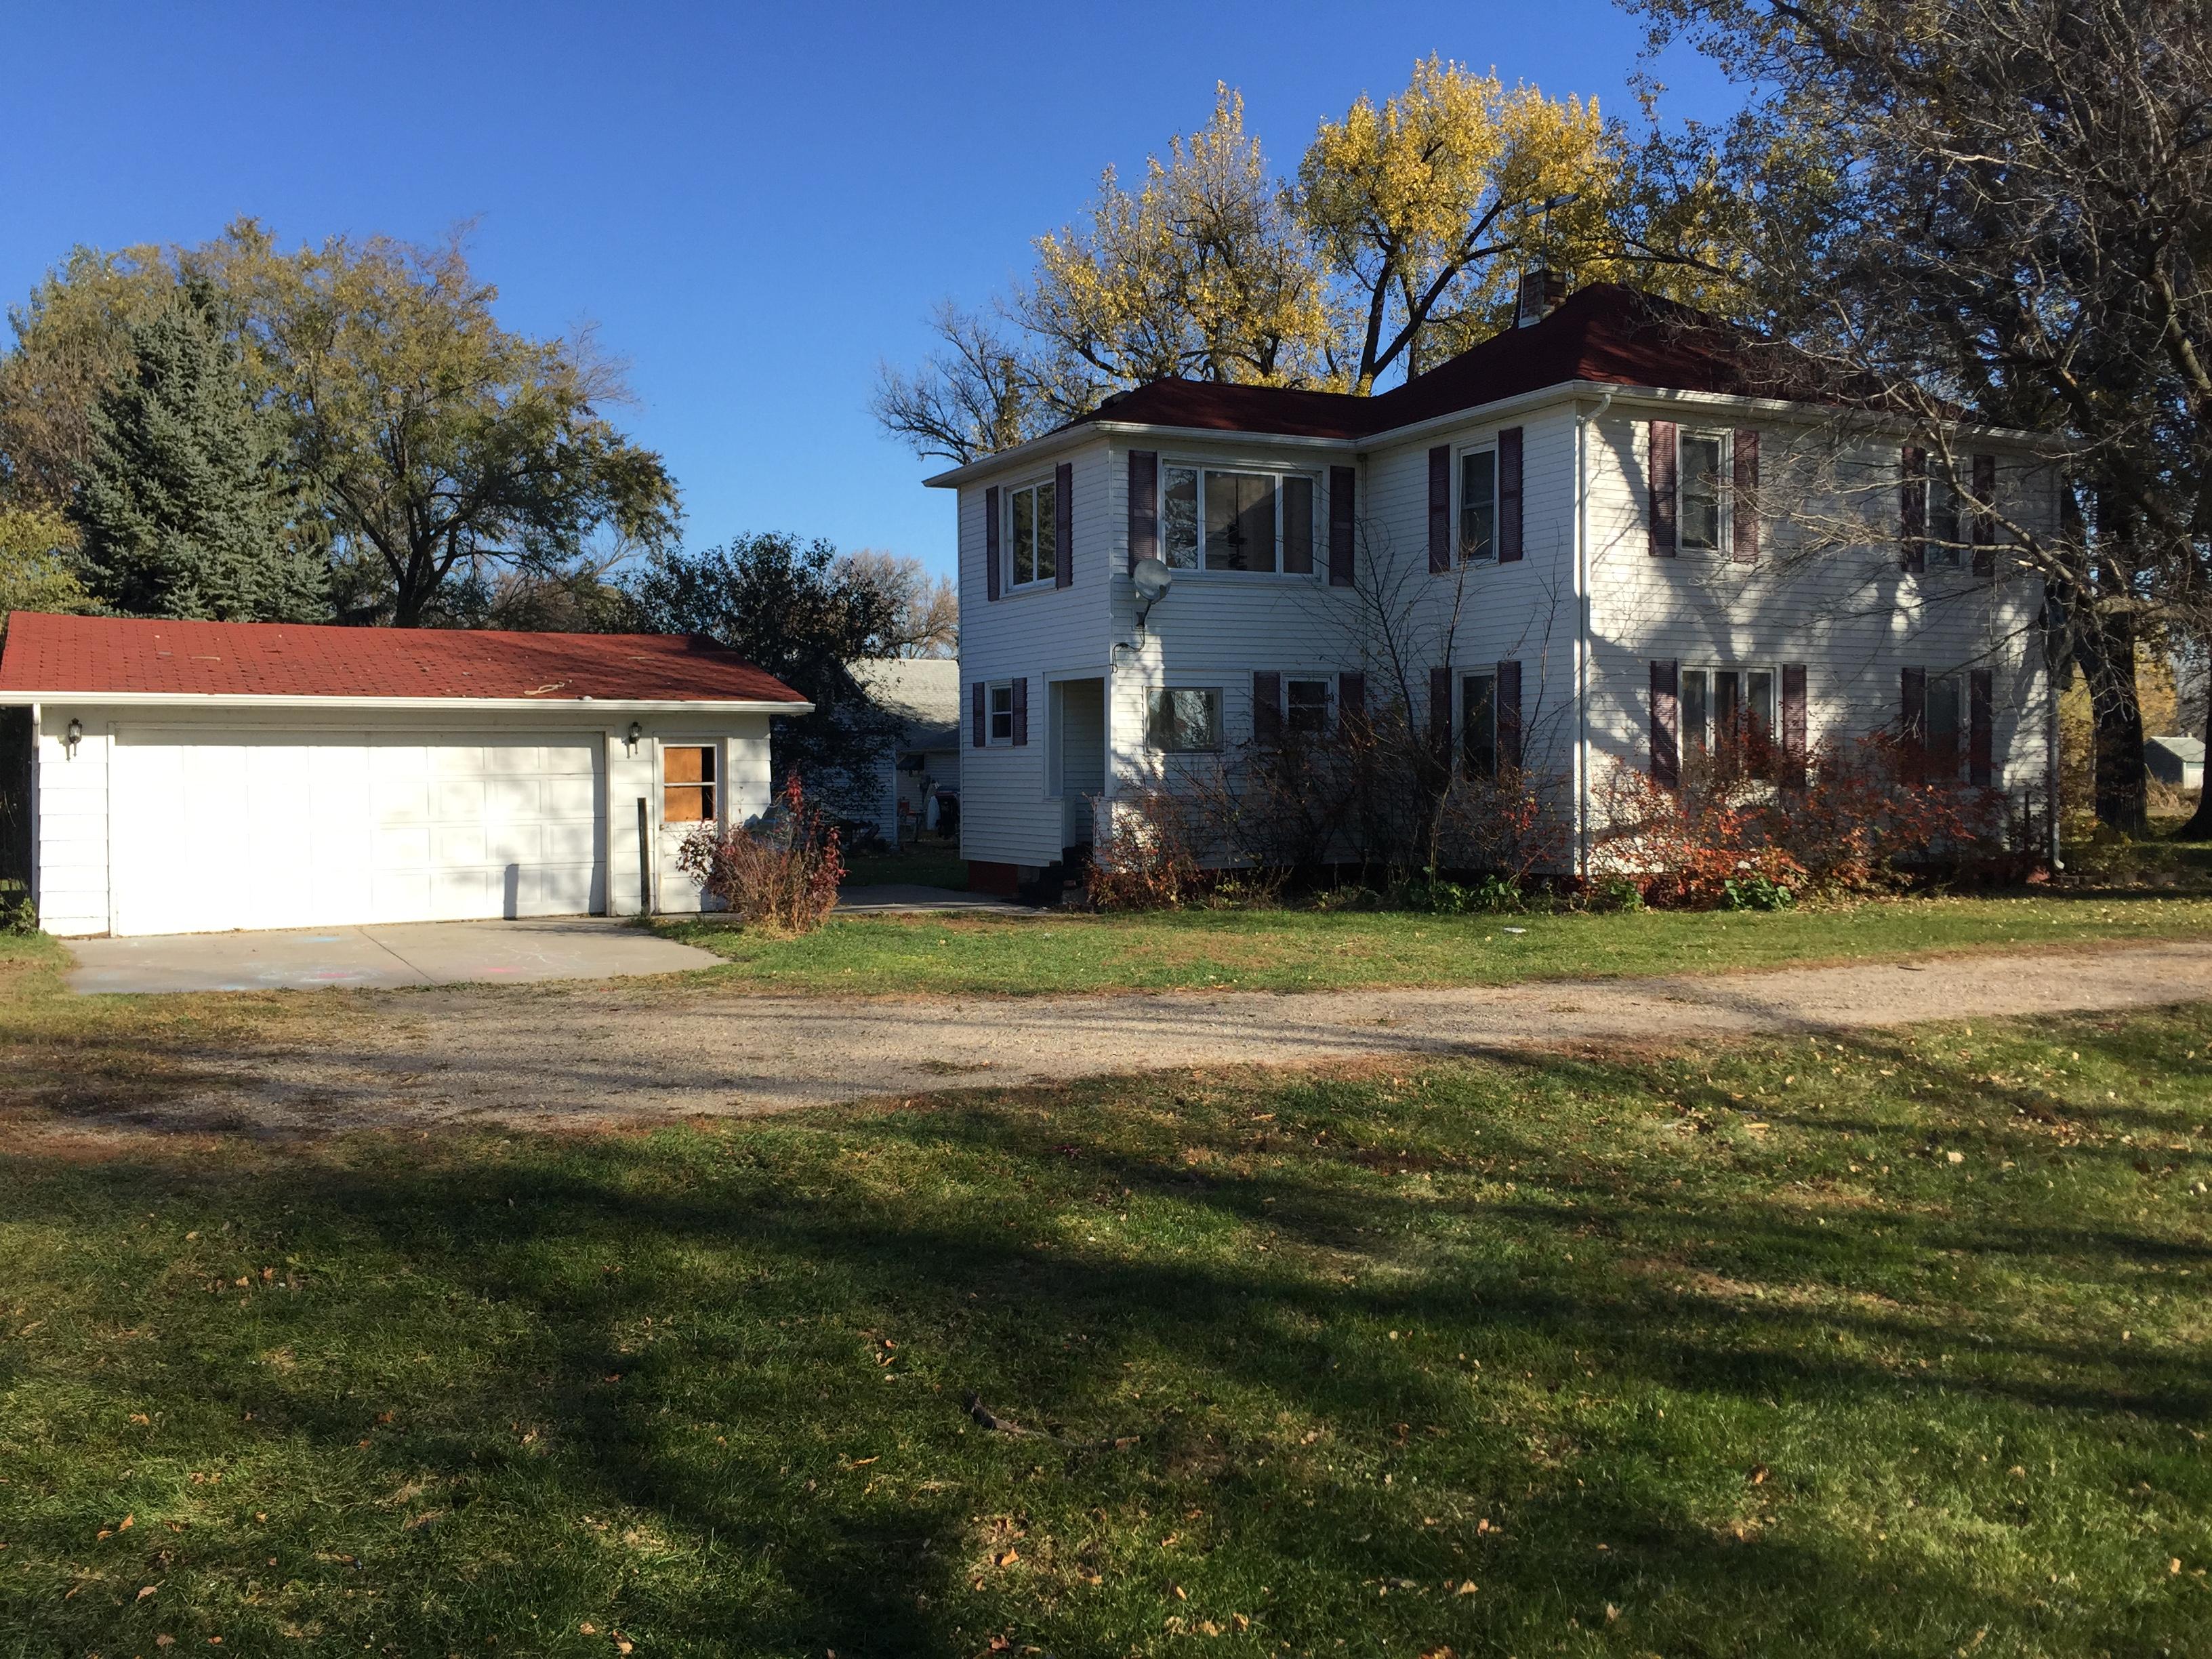 104 Western Ave, Gilby, North Dakota 58235